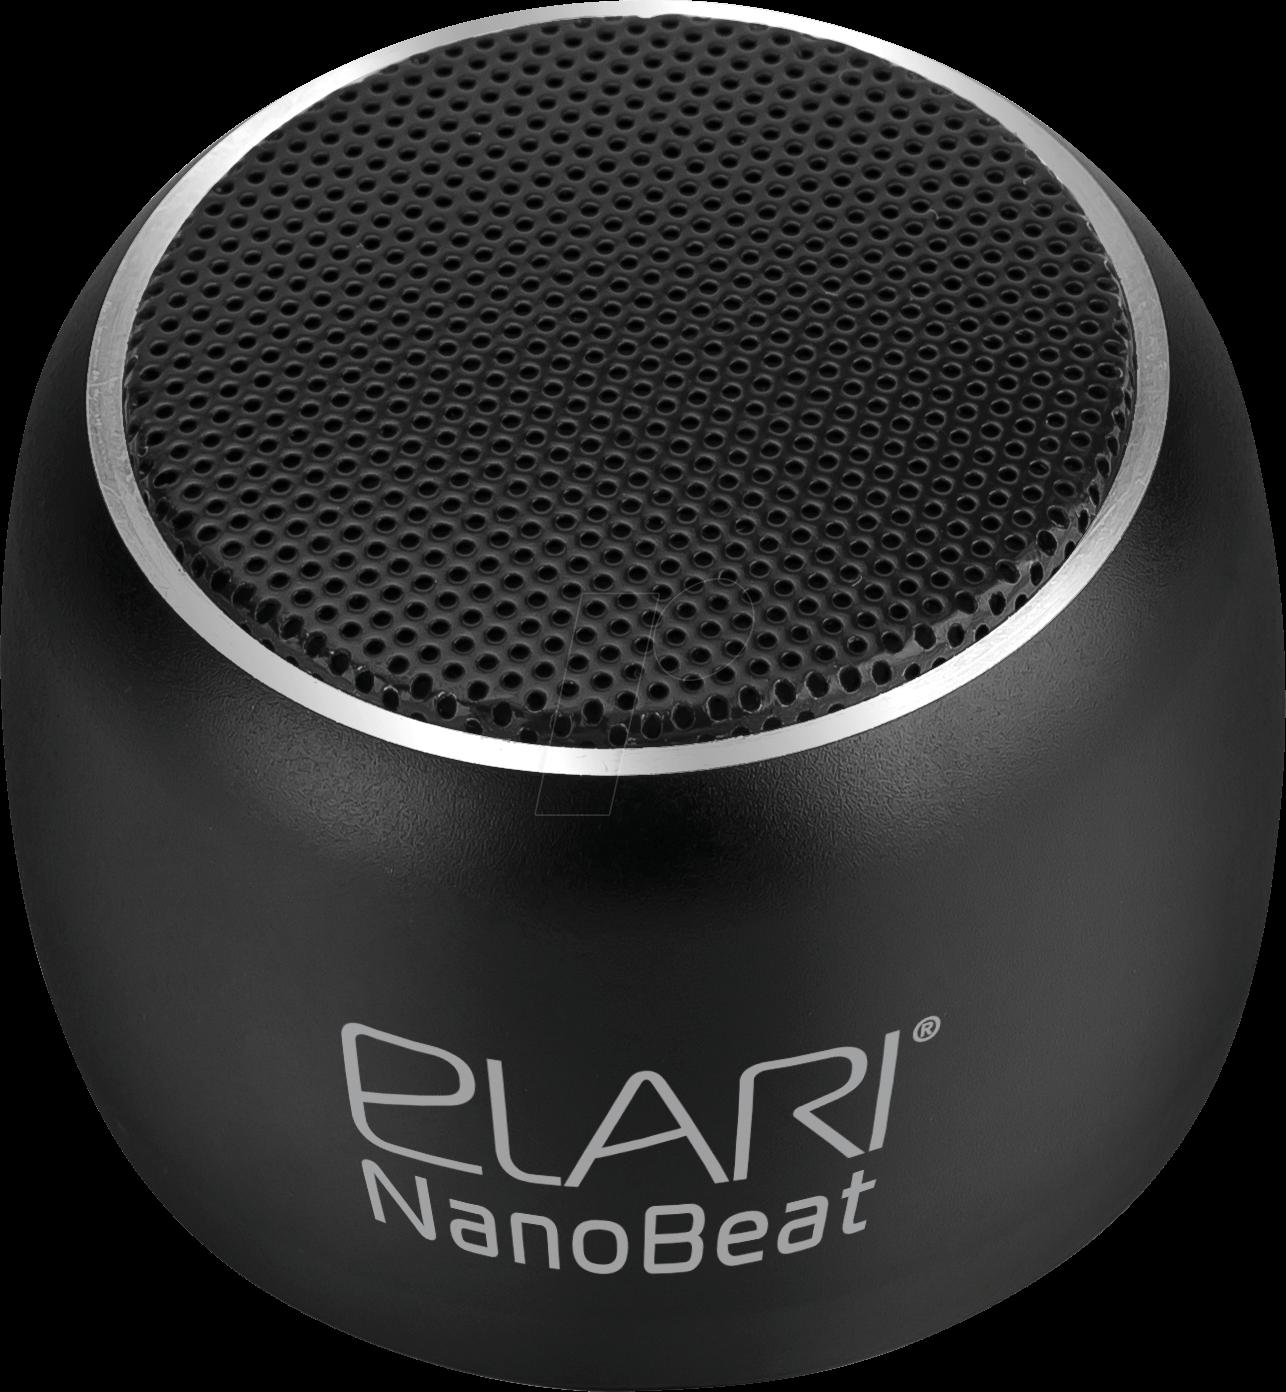 nanobeat bk mini bluetooth lautsprecher schwarz bei. Black Bedroom Furniture Sets. Home Design Ideas